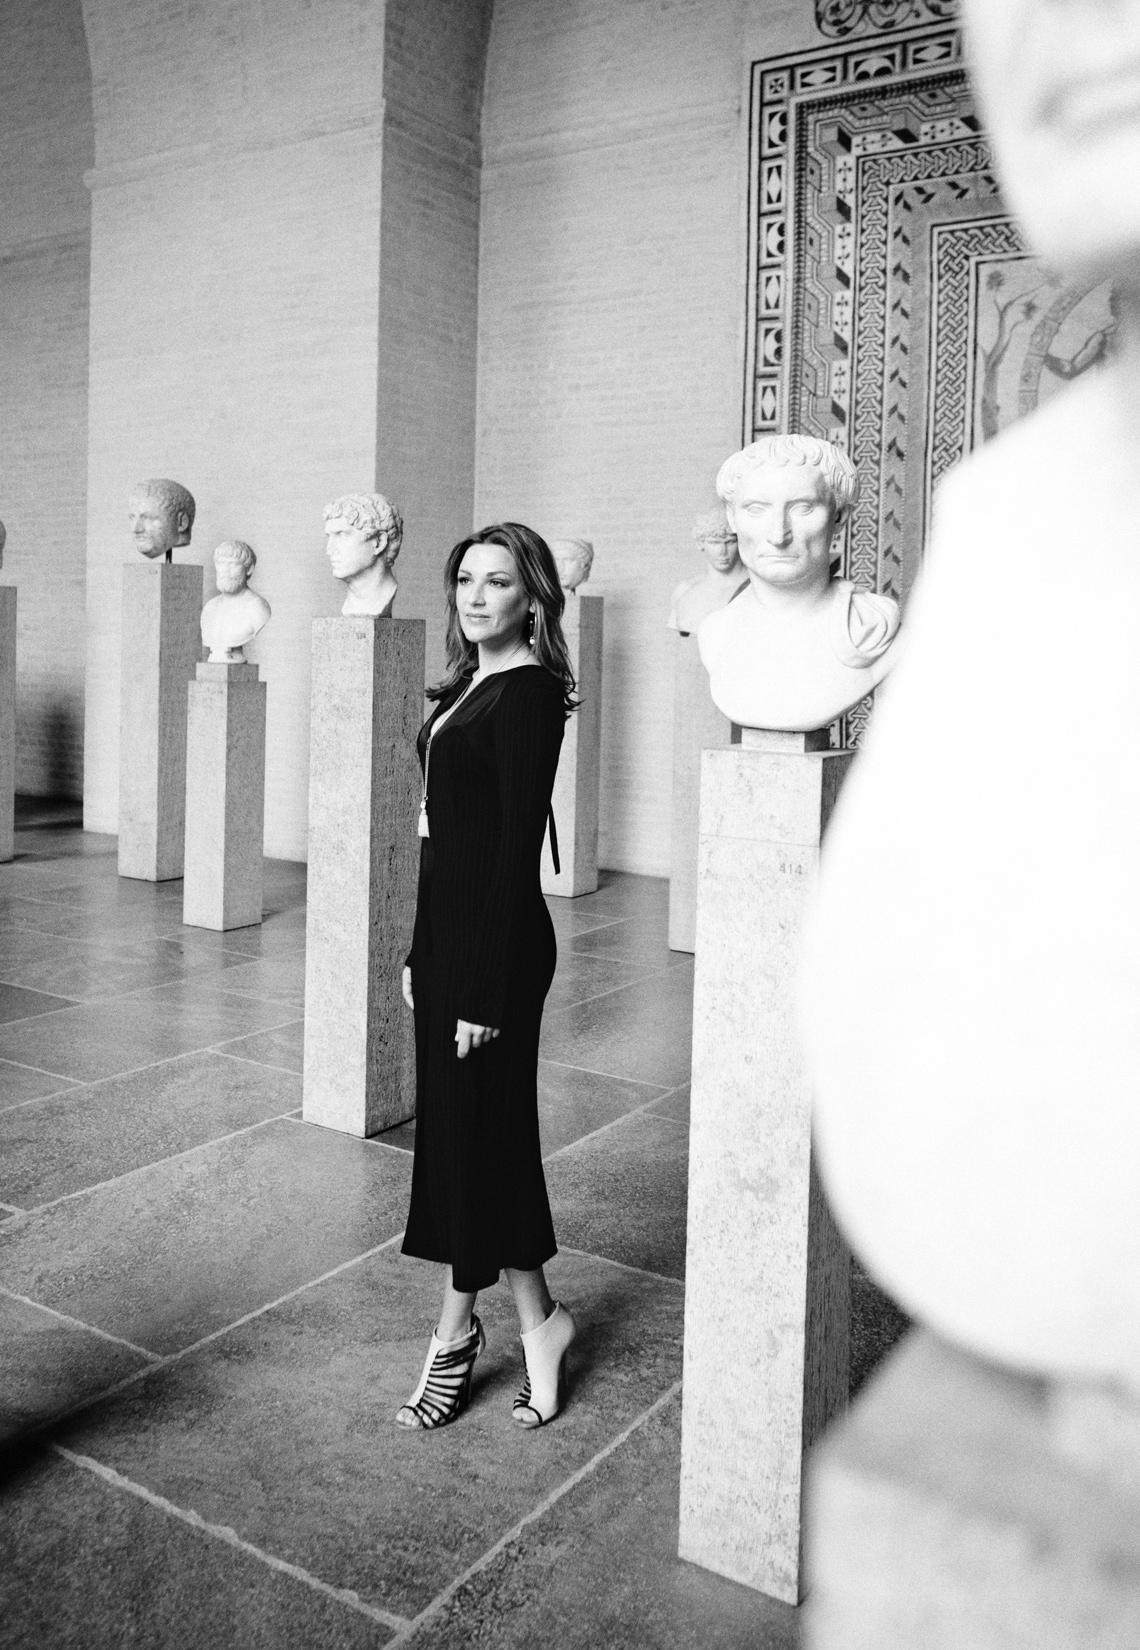 Kluge Köpfe, schöne Frau: GALA fotografierte Kunst-Fan Simone Ballack in der Glyptothek, der berühmten Skulpturensammlung am Münchner Königsplatz